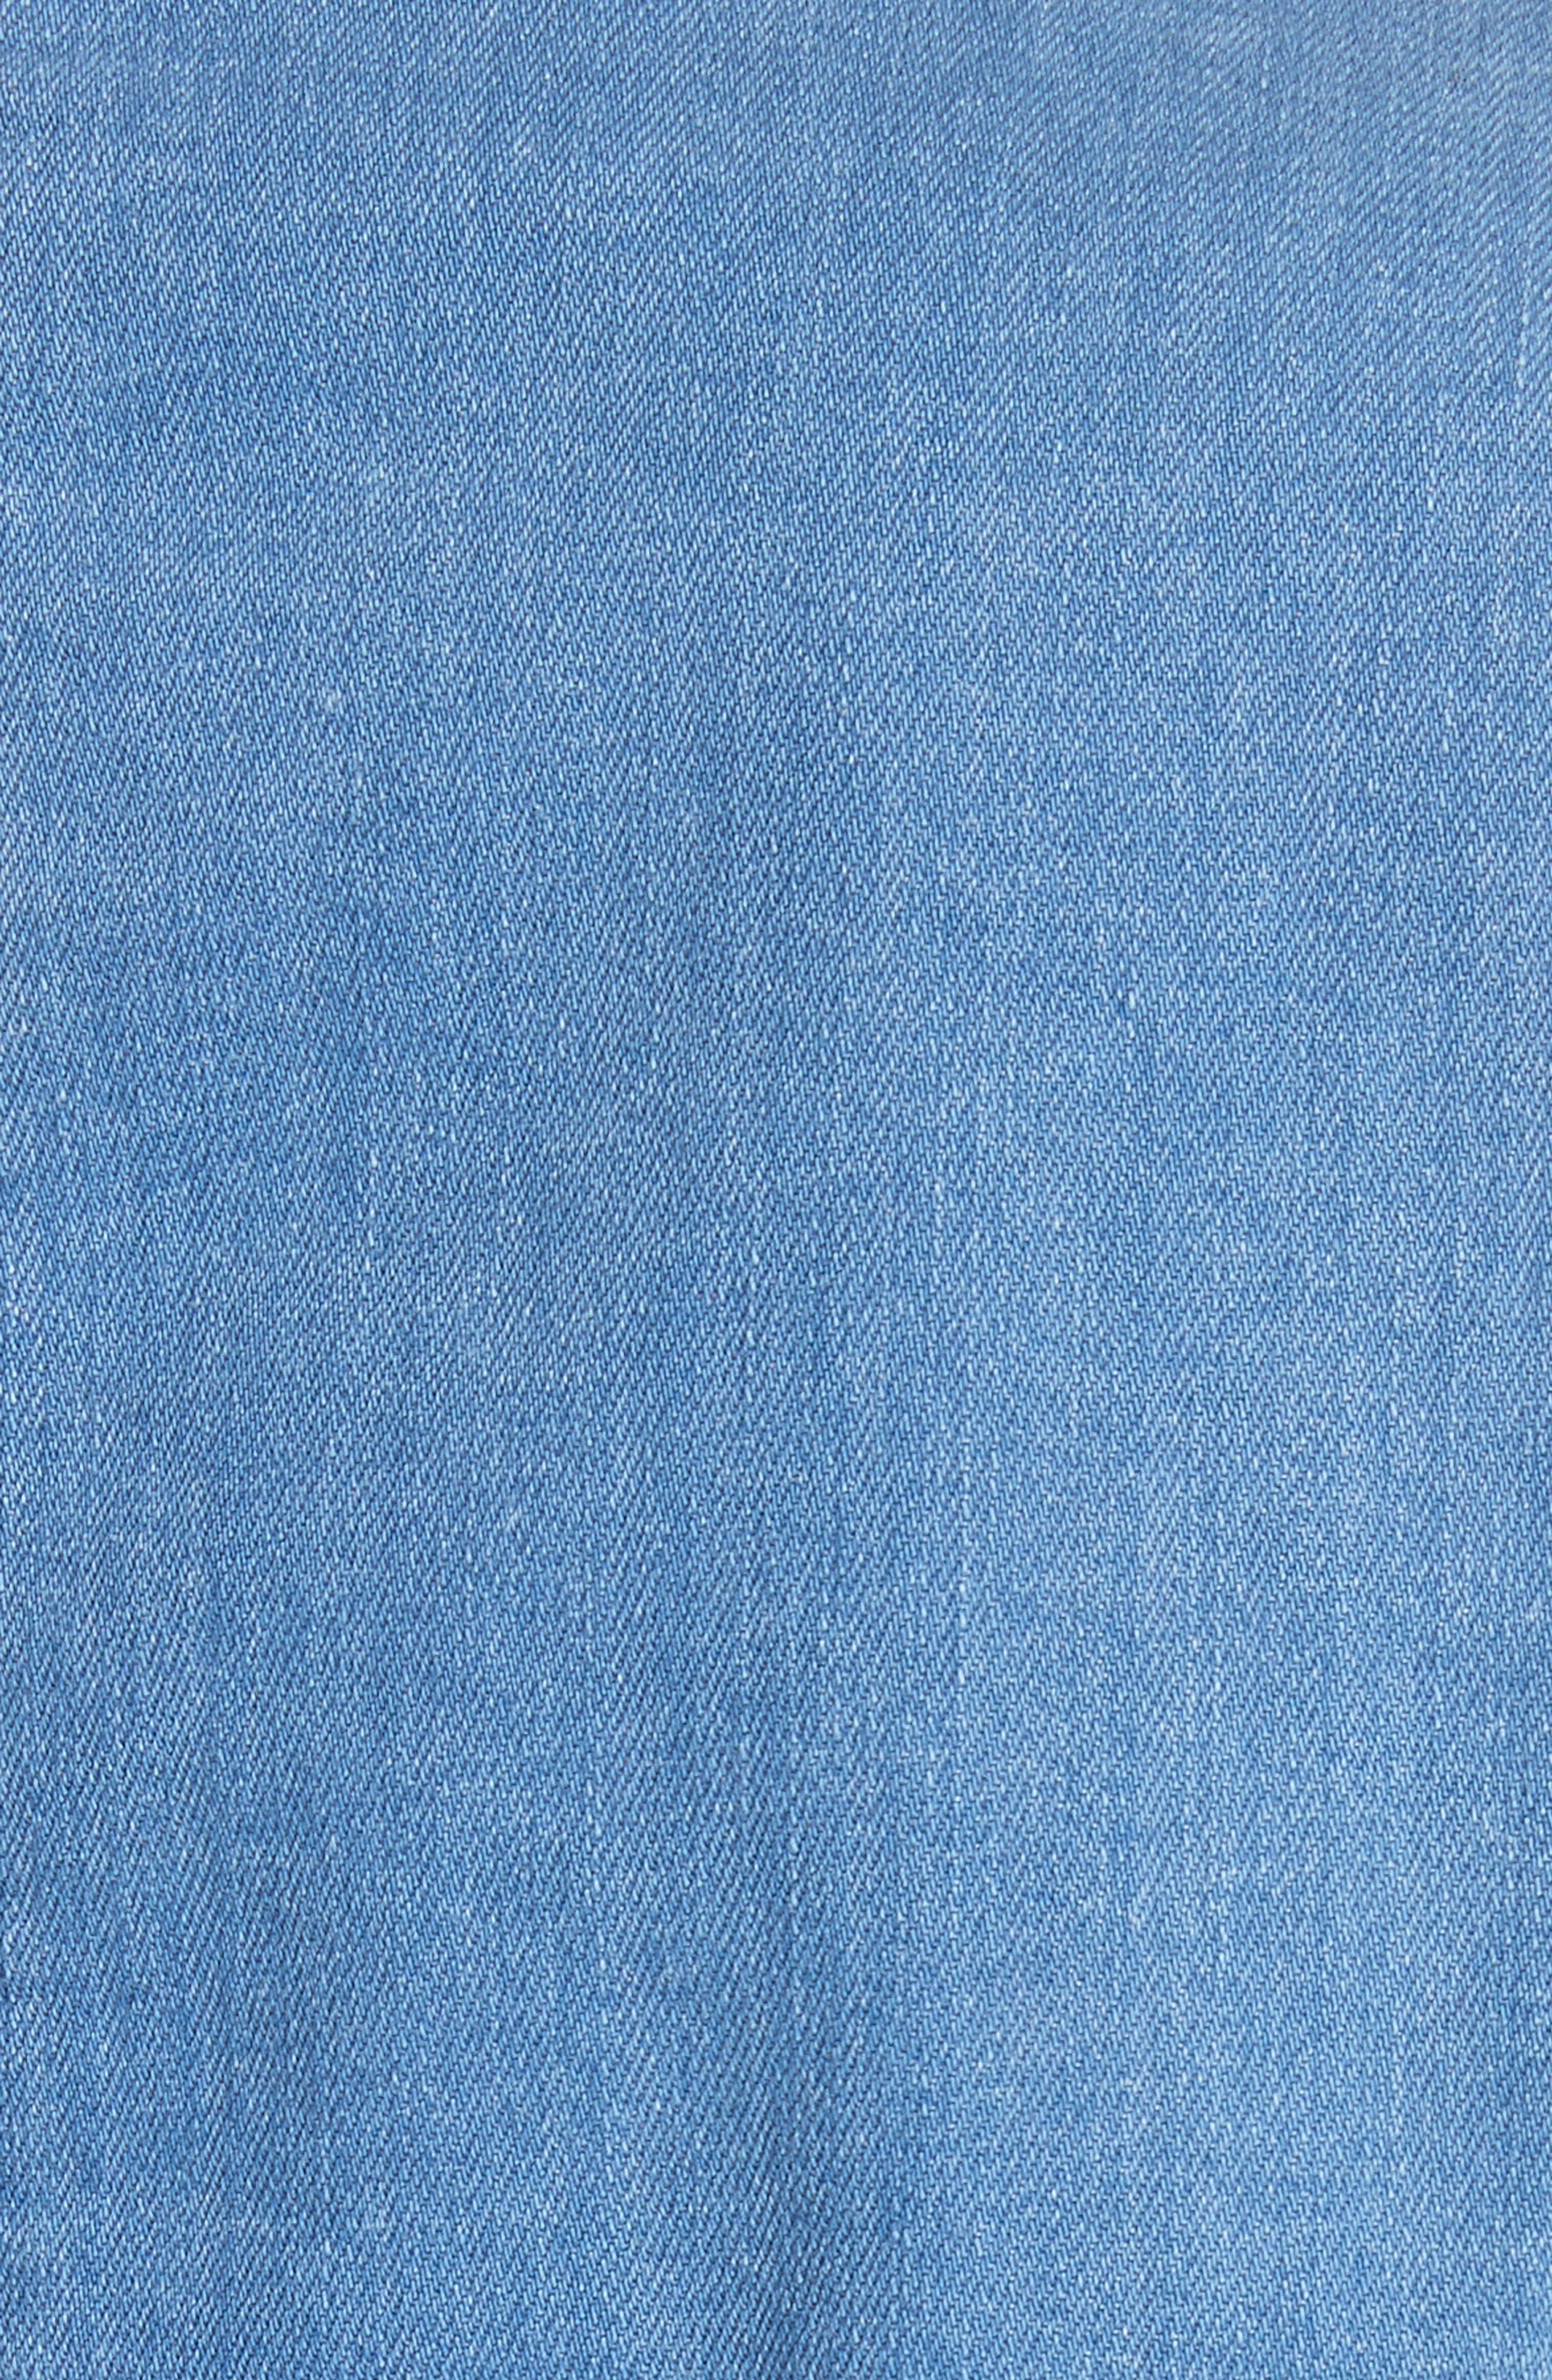 FREE PEOPLE,                             Military Denim Jacket,                             Alternate thumbnail 7, color,                             INDIGO BLUE